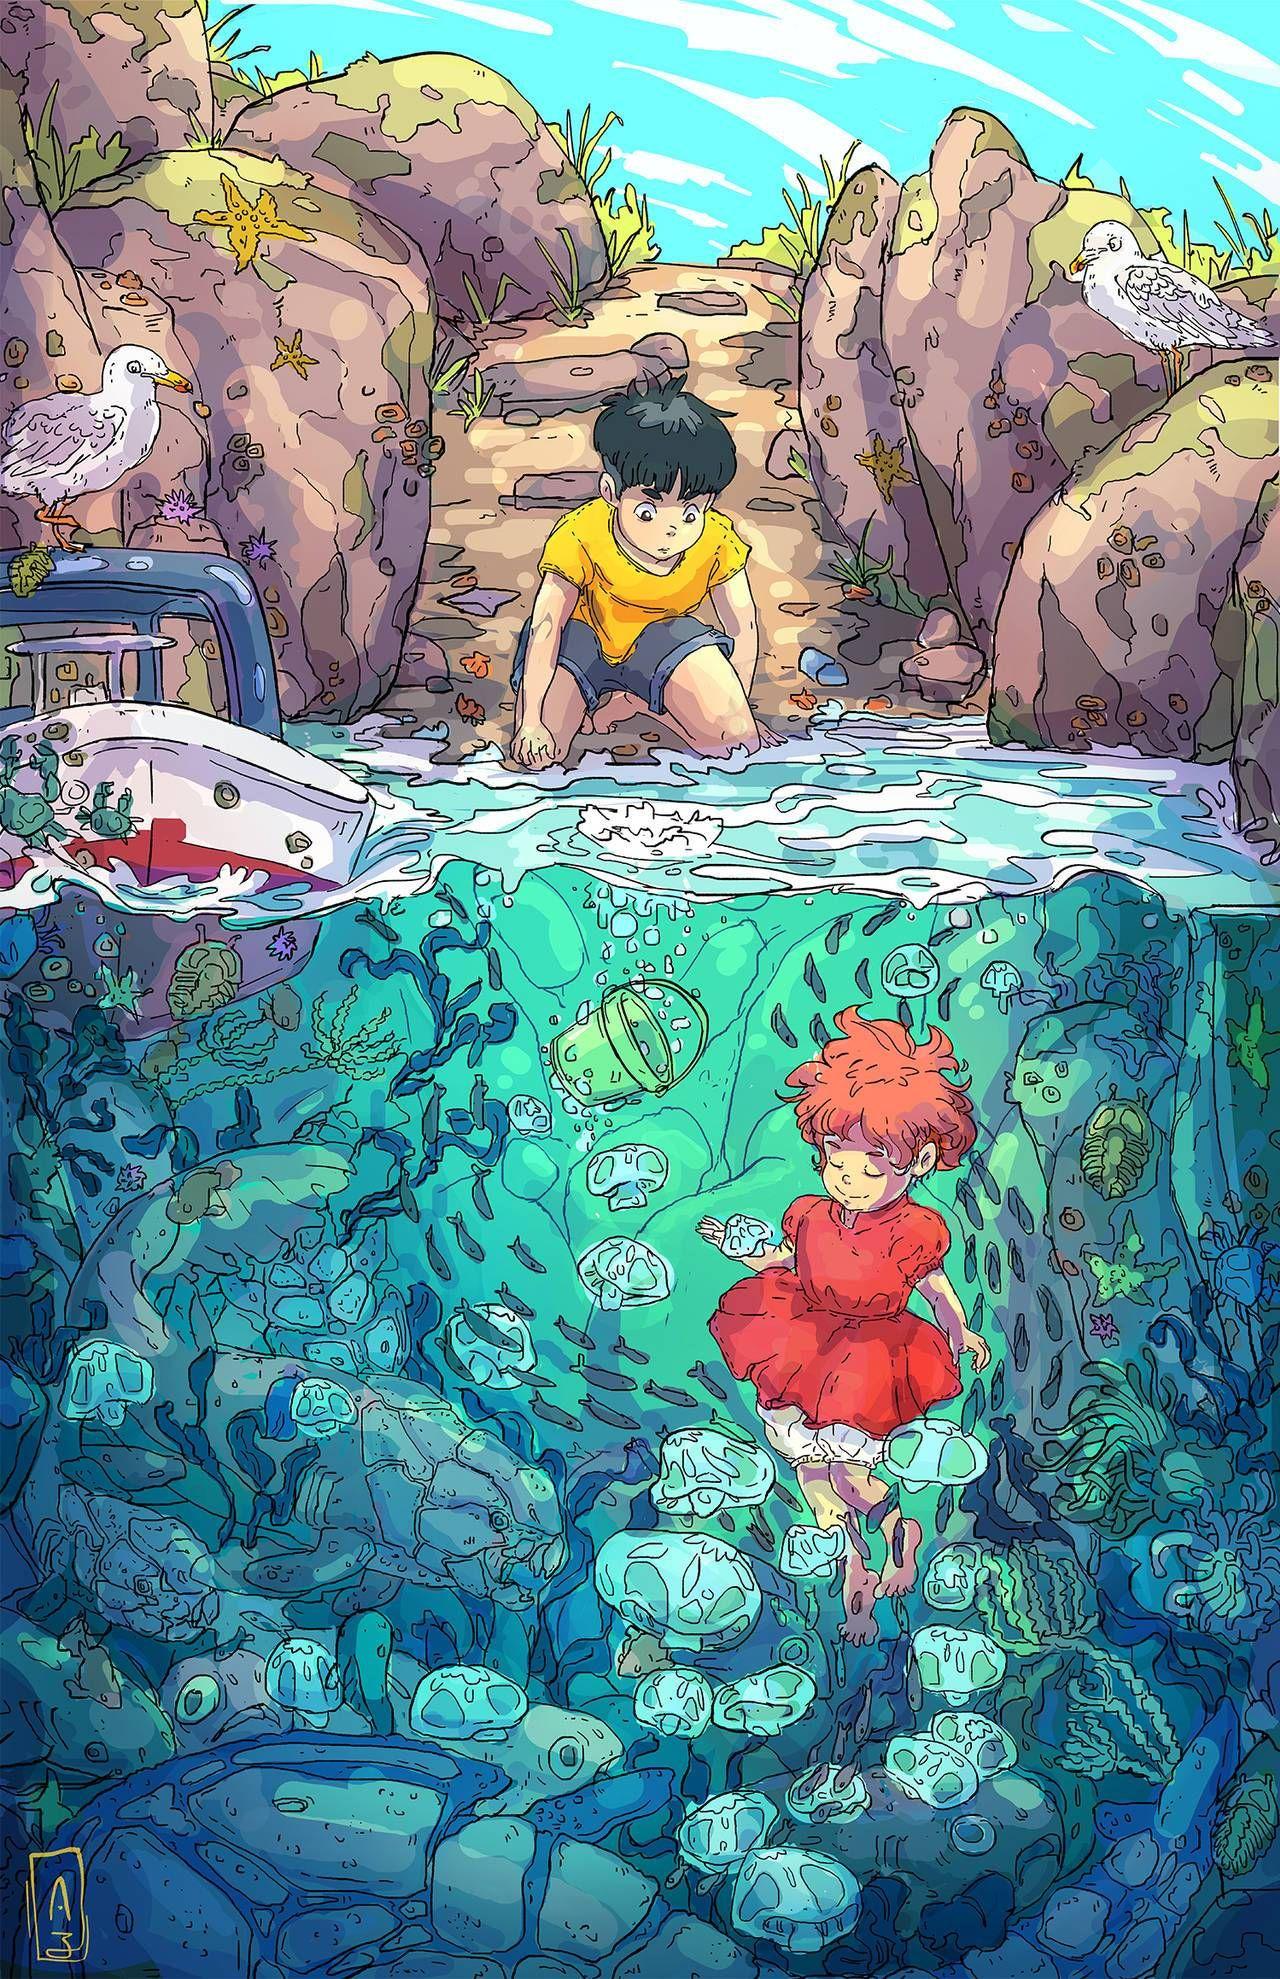 Gake no ue no Ponyo Art studio ghibli, Dessin animé